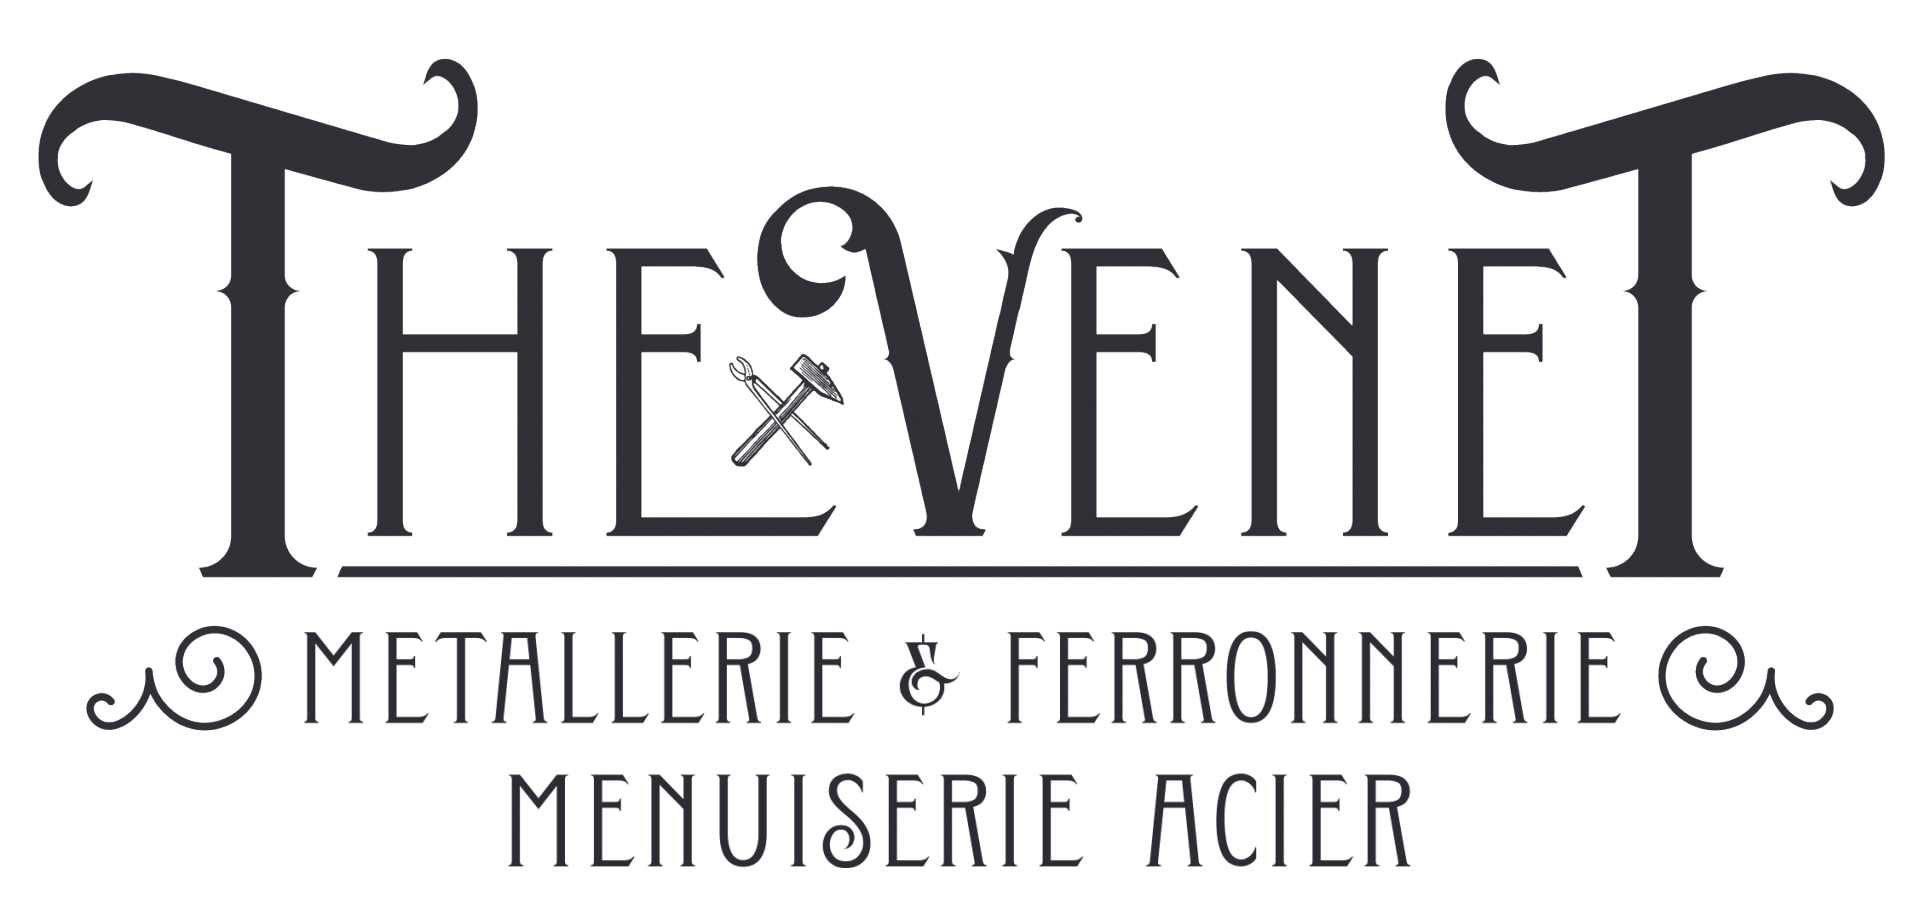 Logo SARL Thevenet Pere et Fils